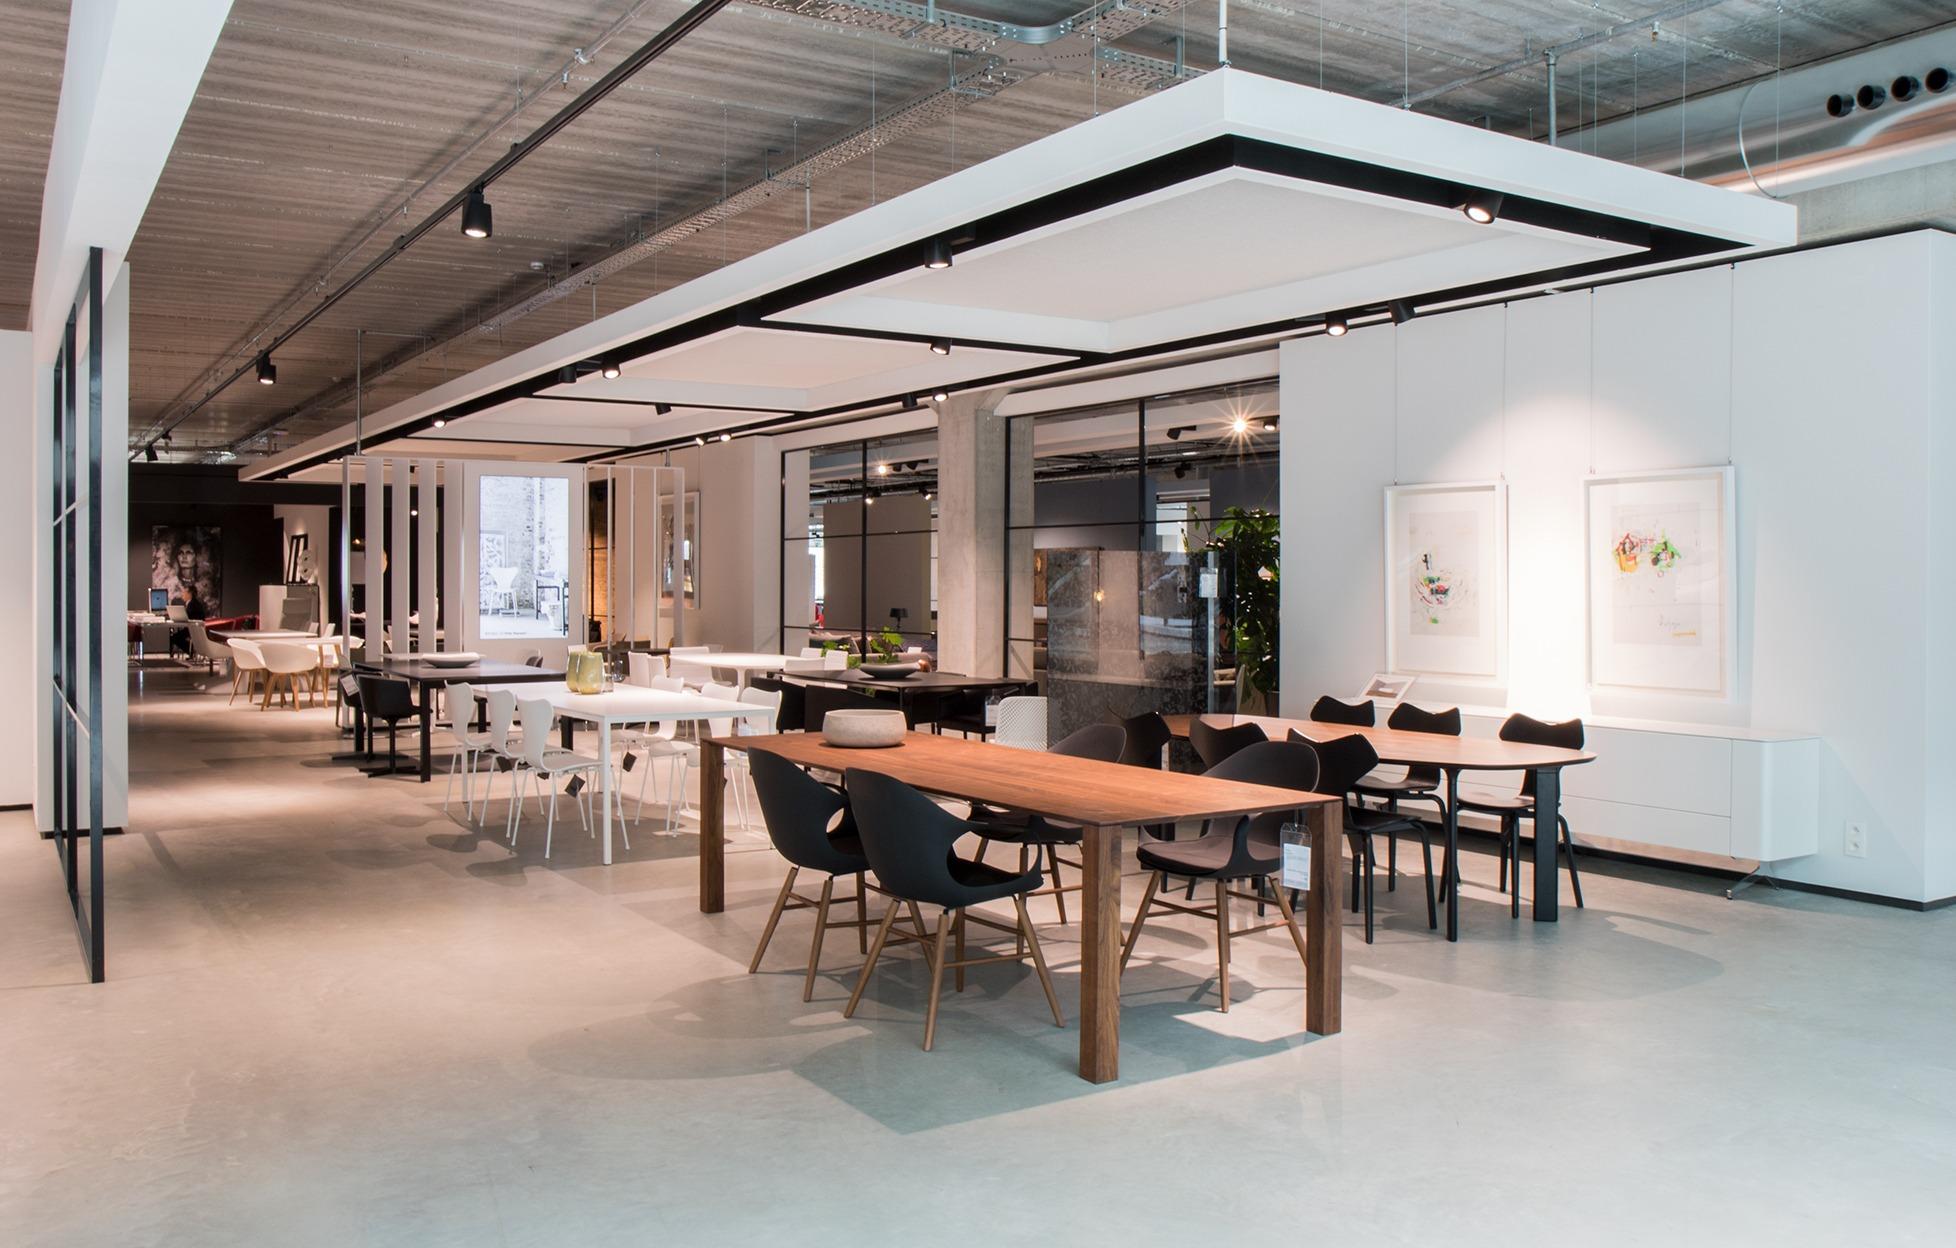 Top Interieur Massenhove 2